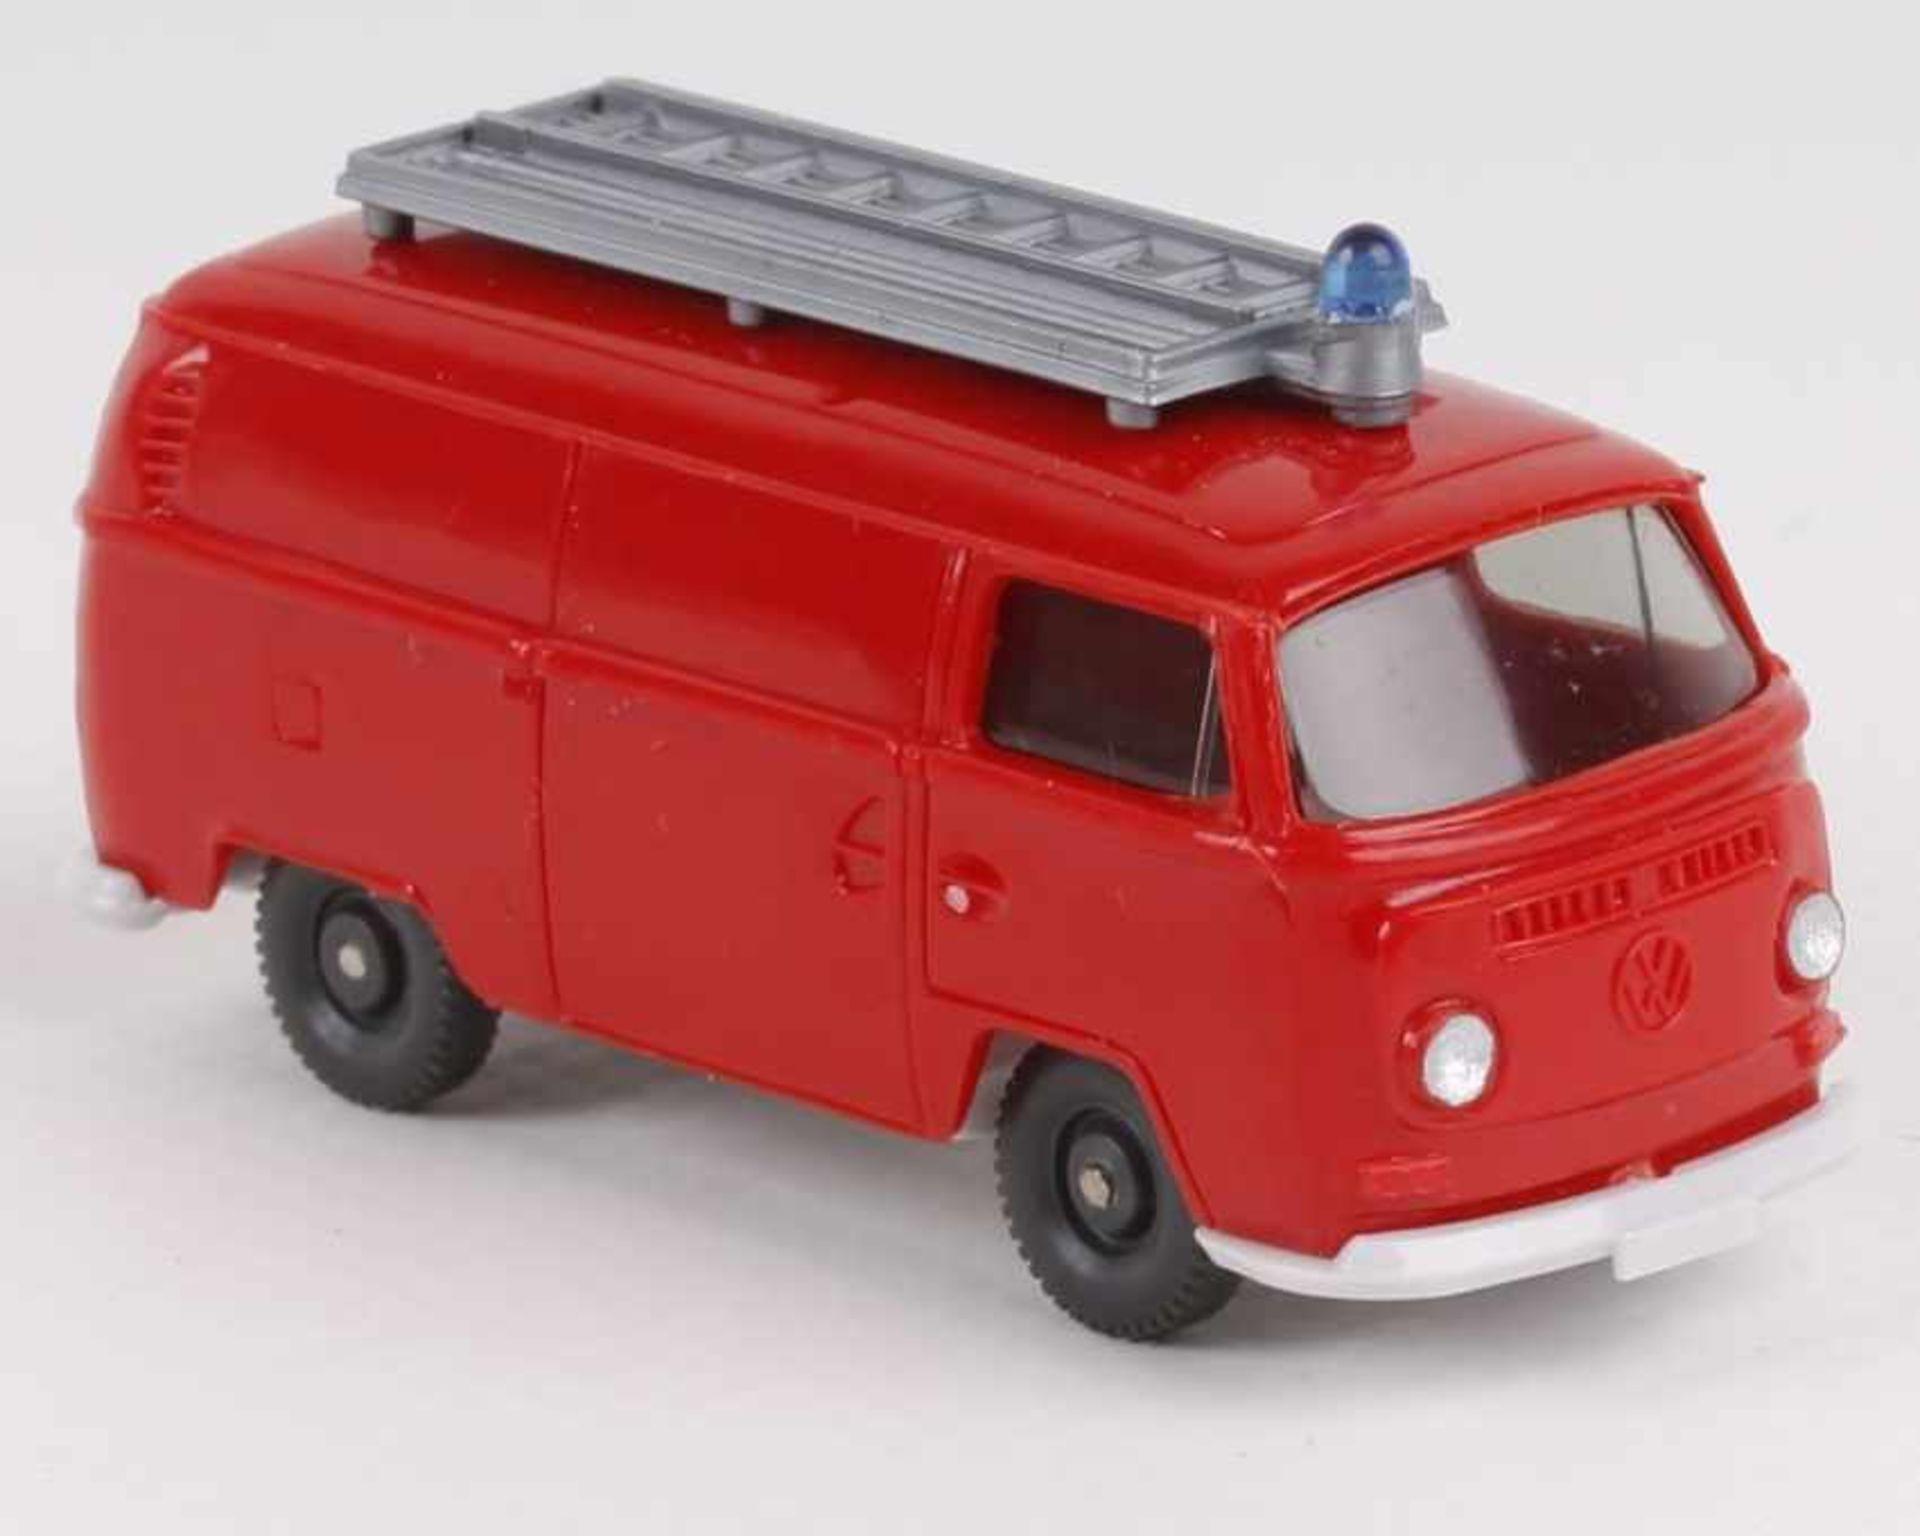 Los 1043 - WikingVW T2 Feuerwehr orangerot603/8a, neuwertig